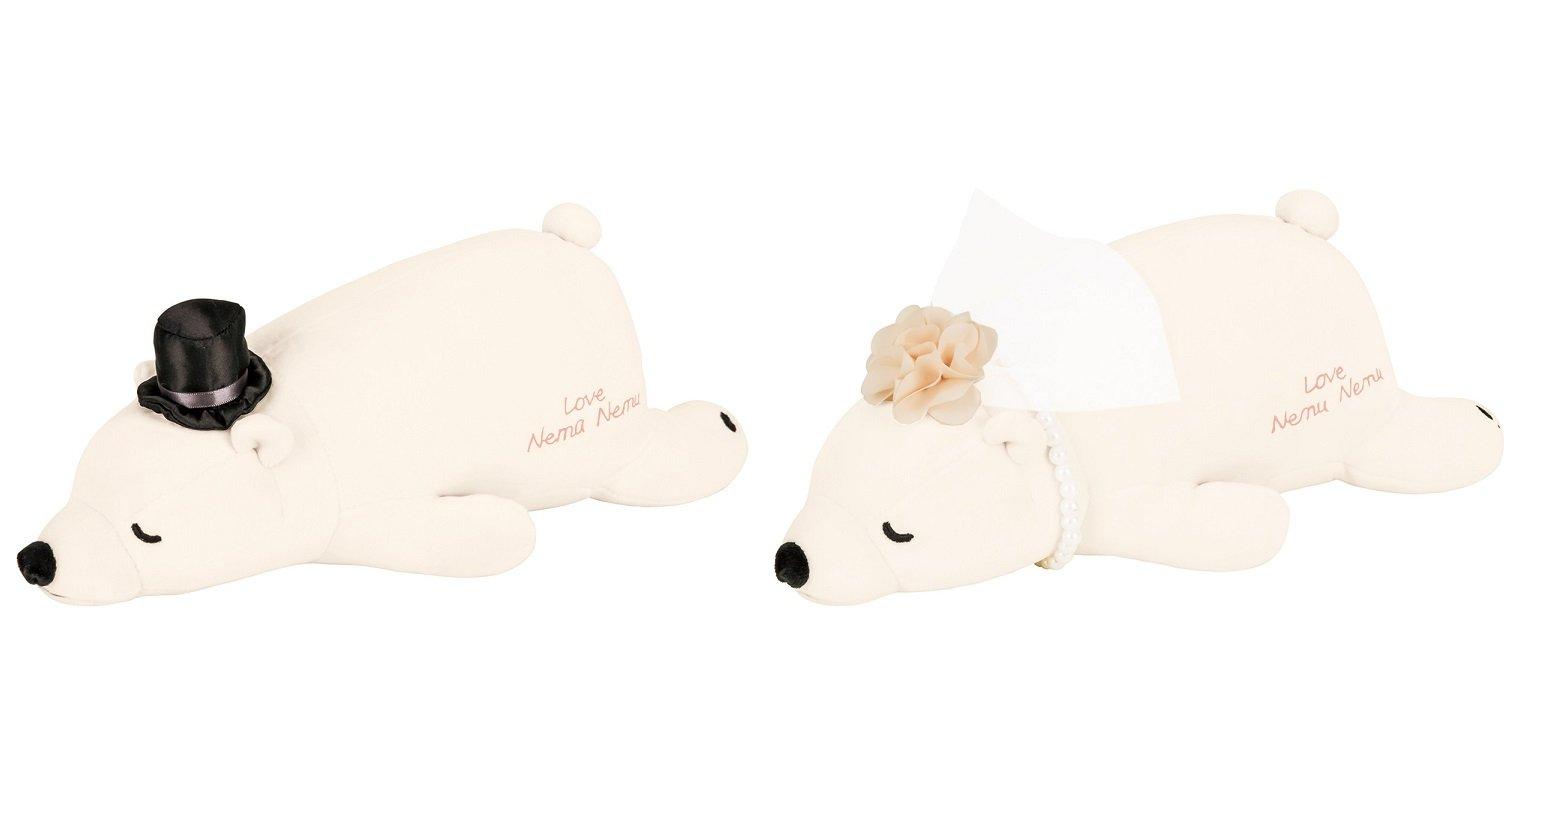 LivHeart Cushion Body Pillow Hug Pillow Wedding Nemu Nemu 2 Polar Bears set 48952-11